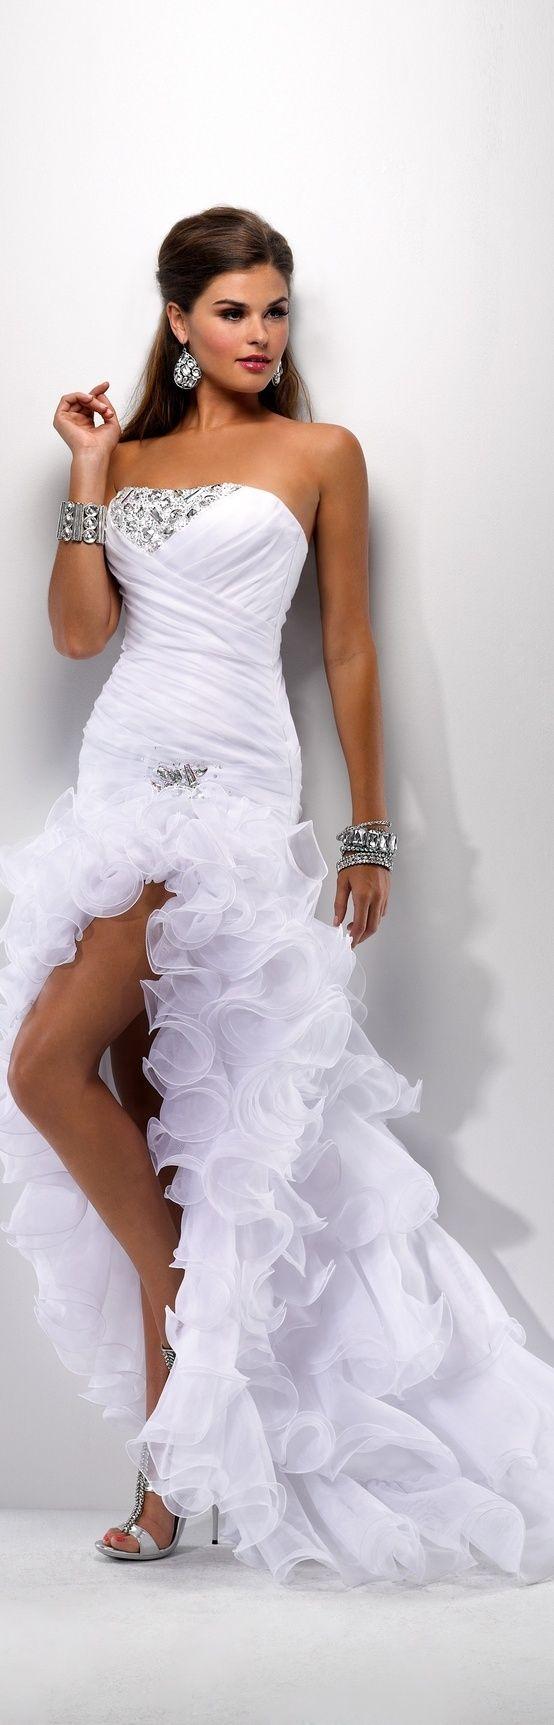 Best images about EveningFormal Dresses on Pinterest Sherri